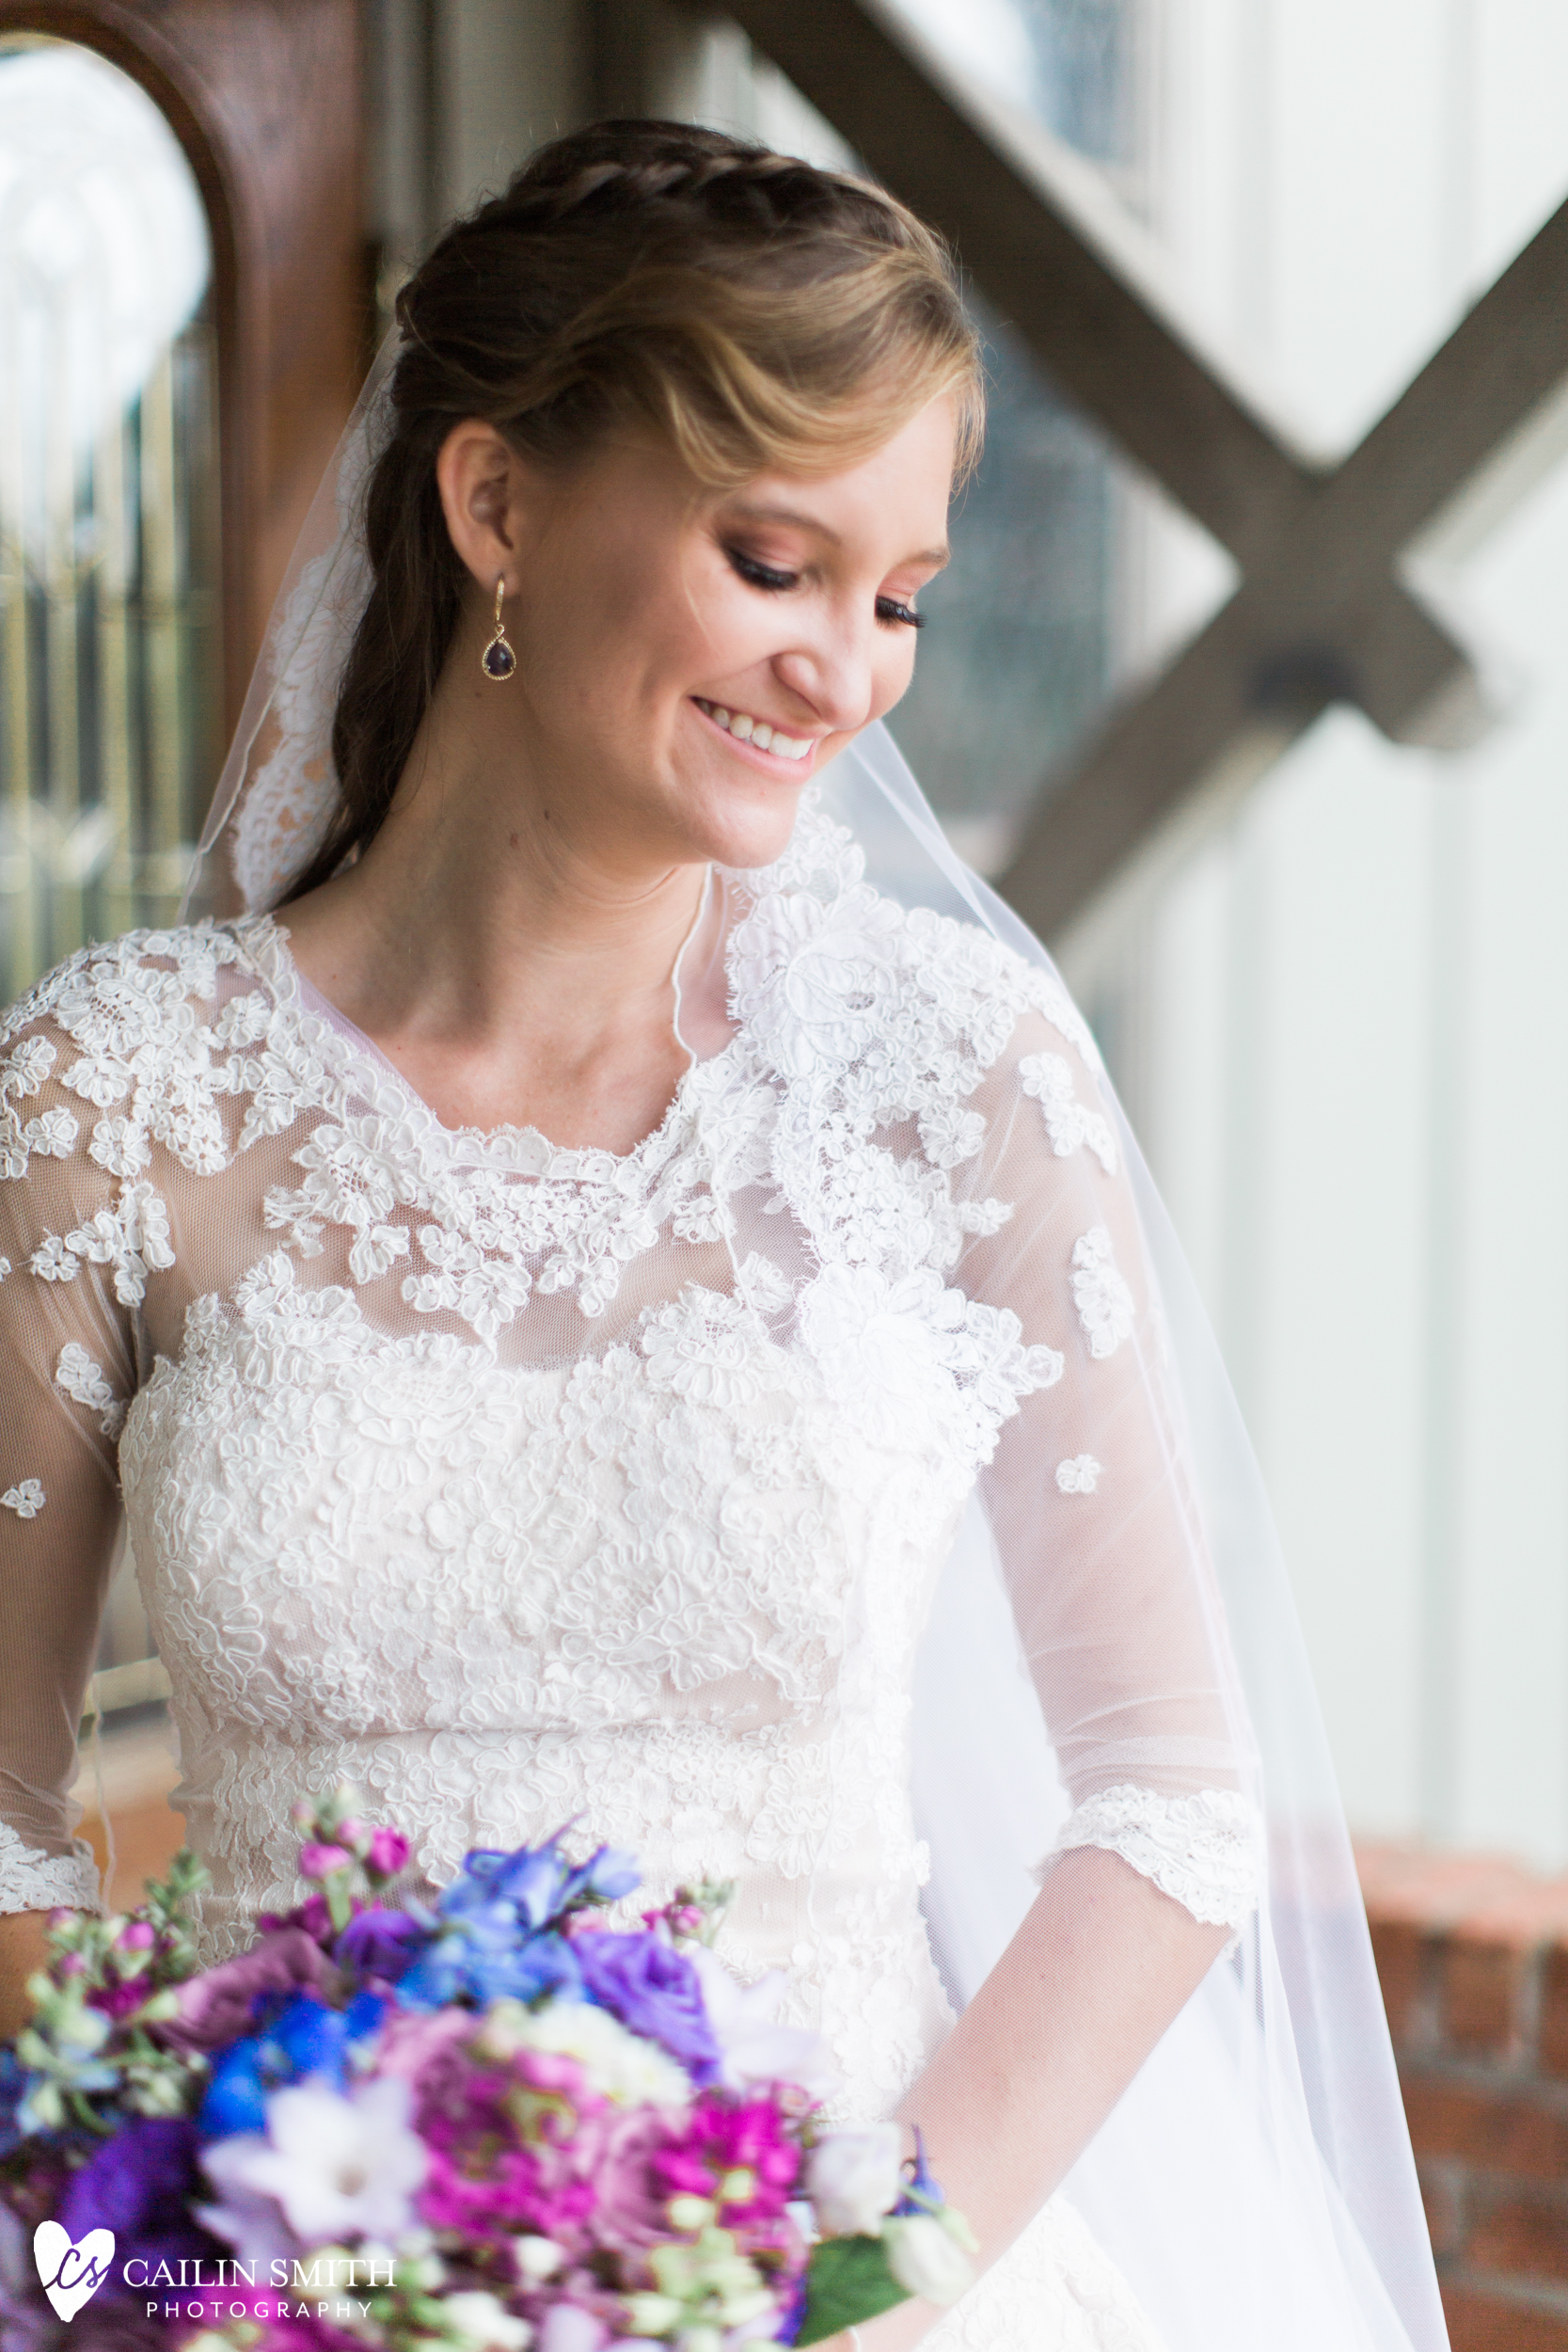 Shannon_David_Grace_Episcopal_Church_Wedding_photography_001.jpg